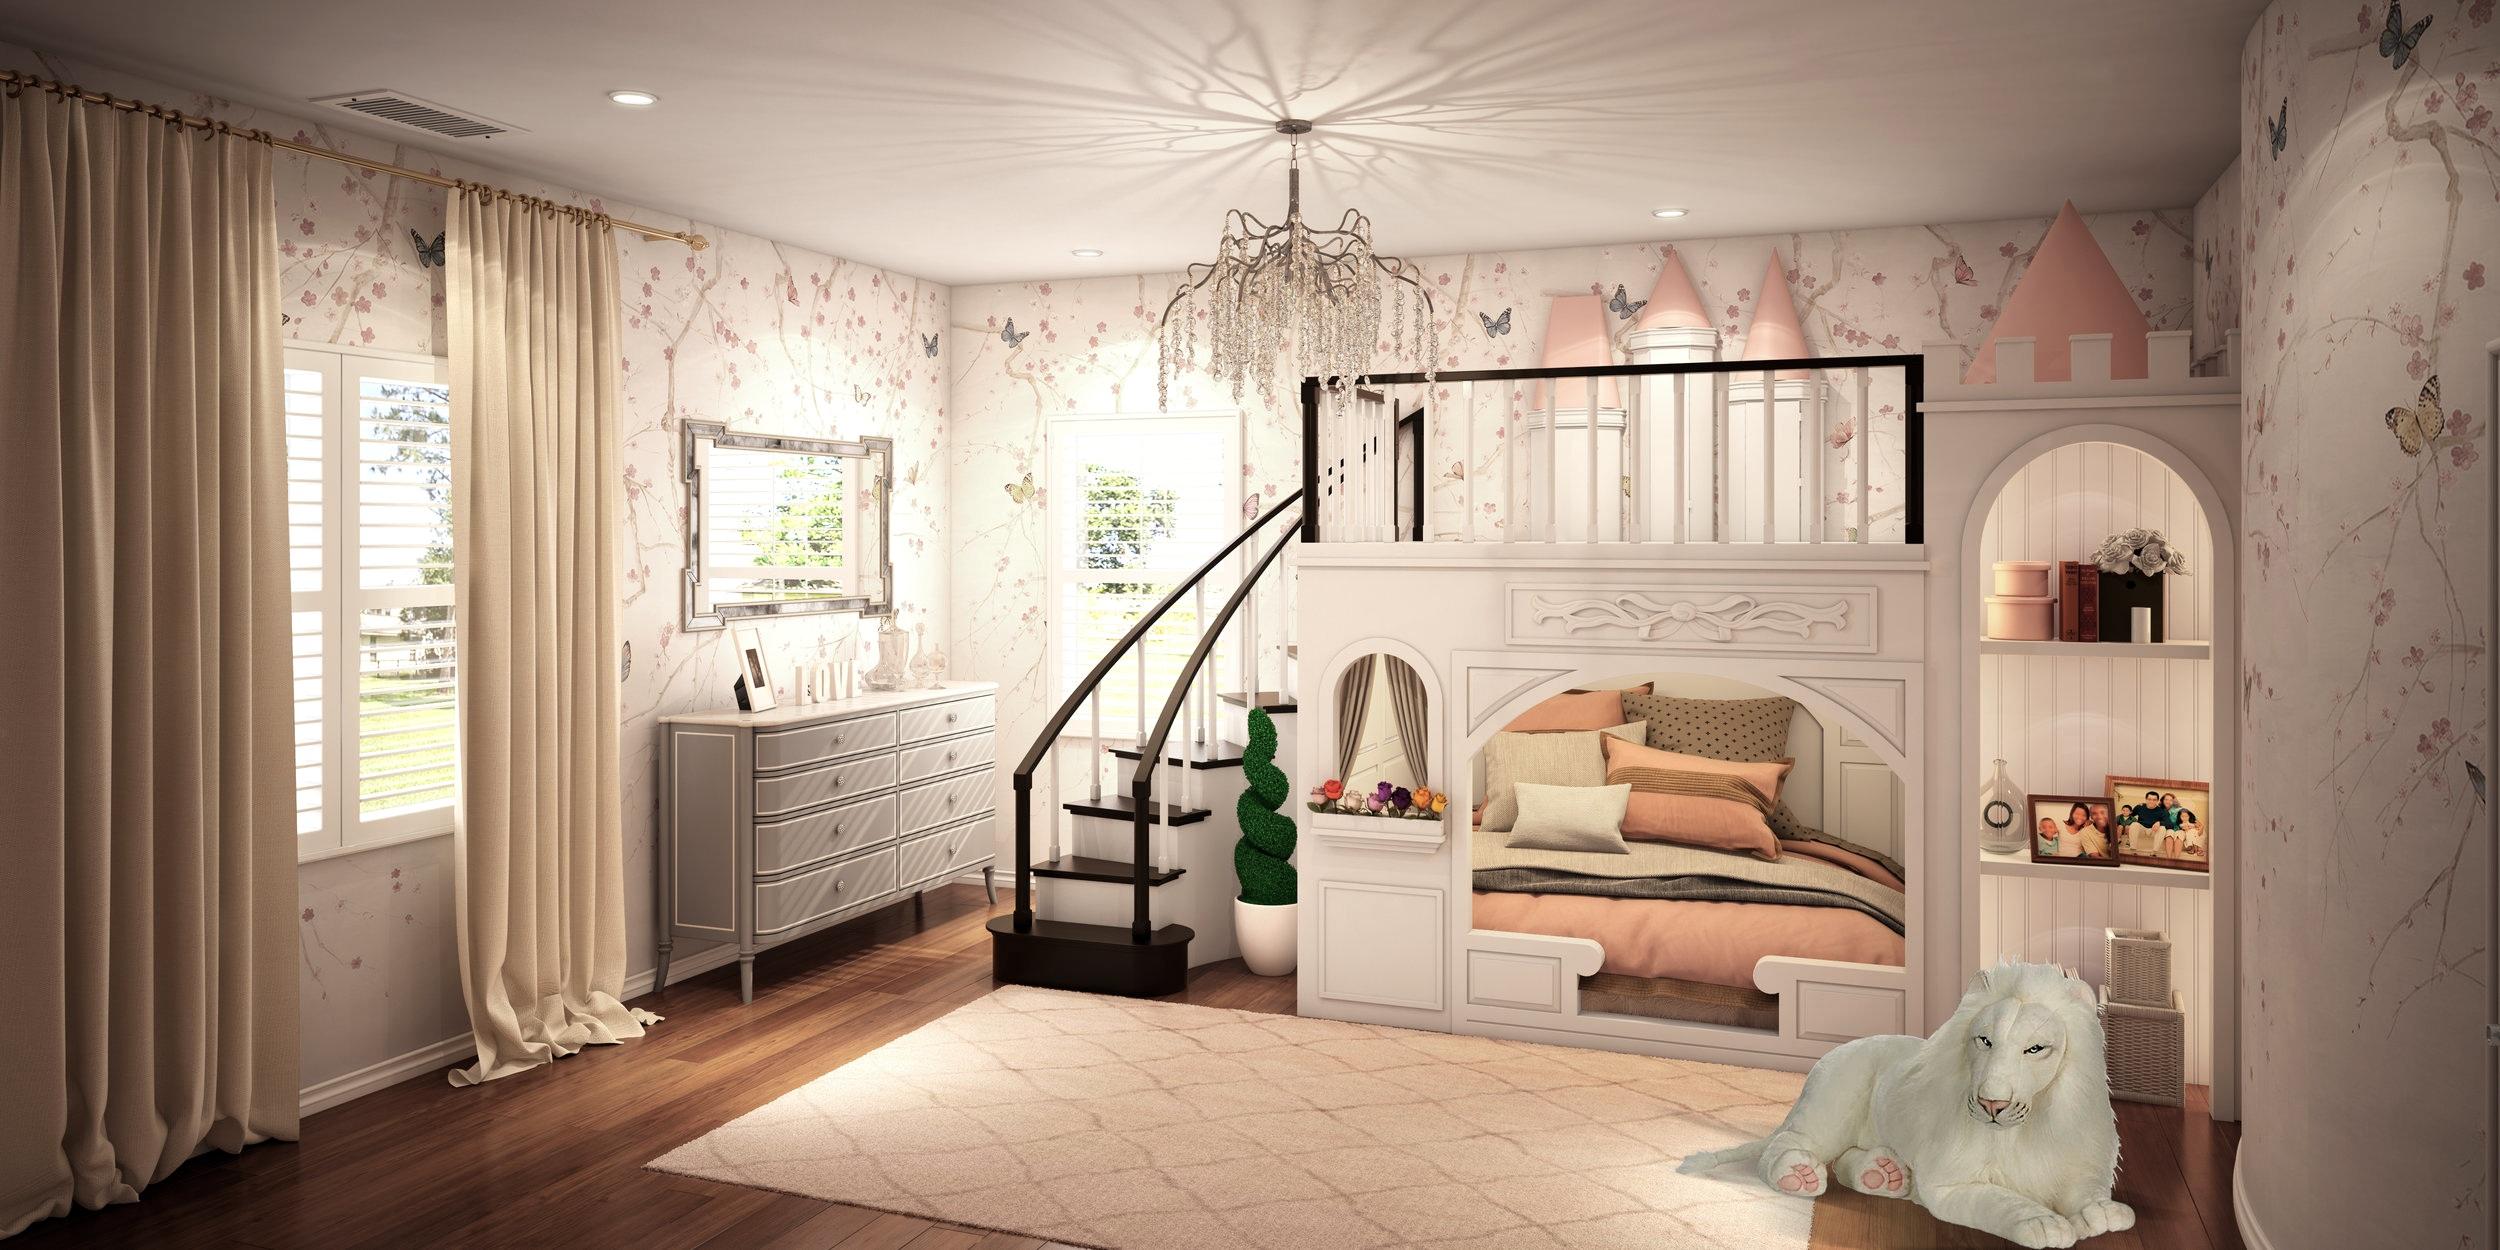 Ava's Castle Bedroom